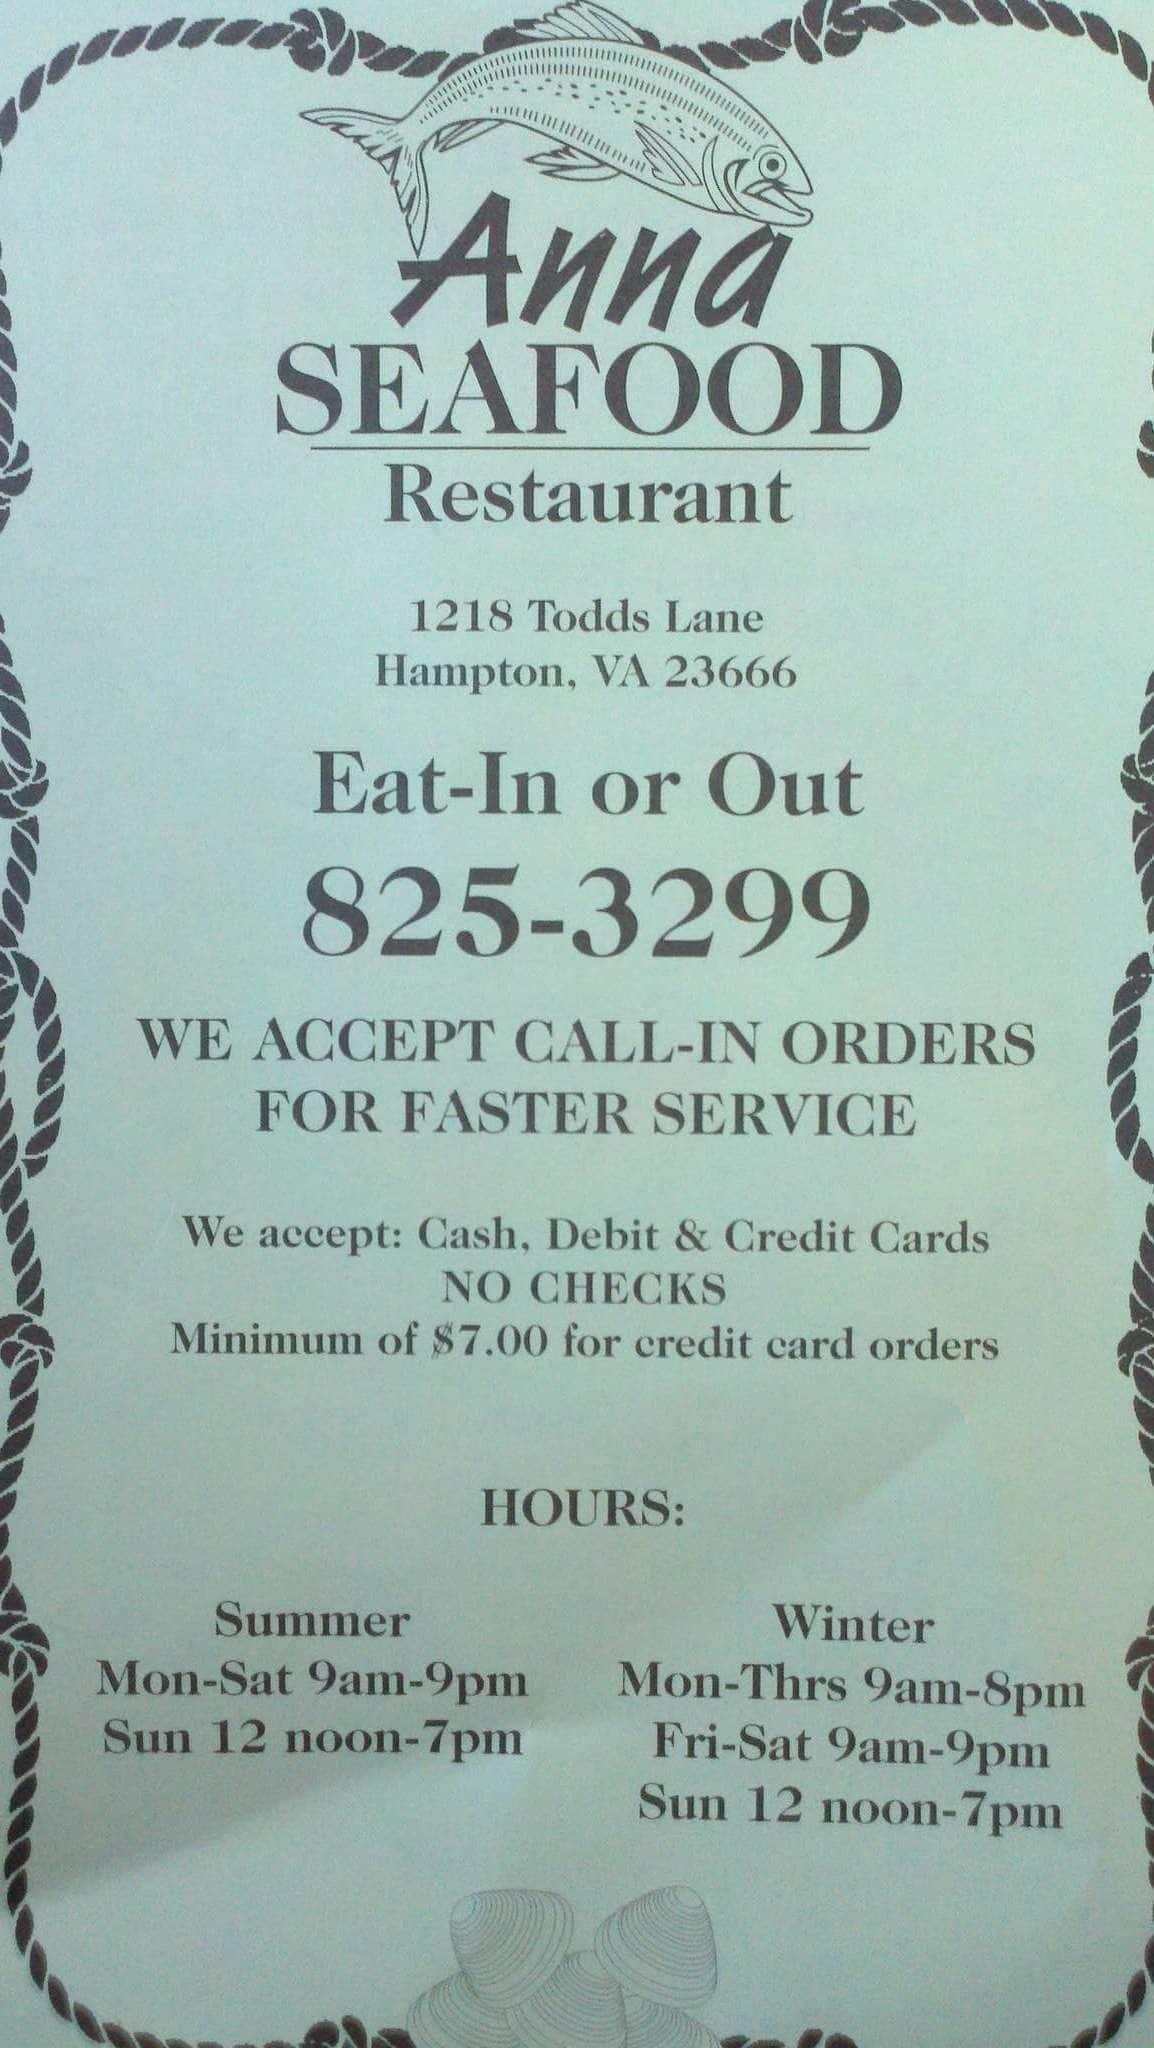 Anna Seafood Menu, Menu for Anna Seafood, Hampton, Hampton Roads ...